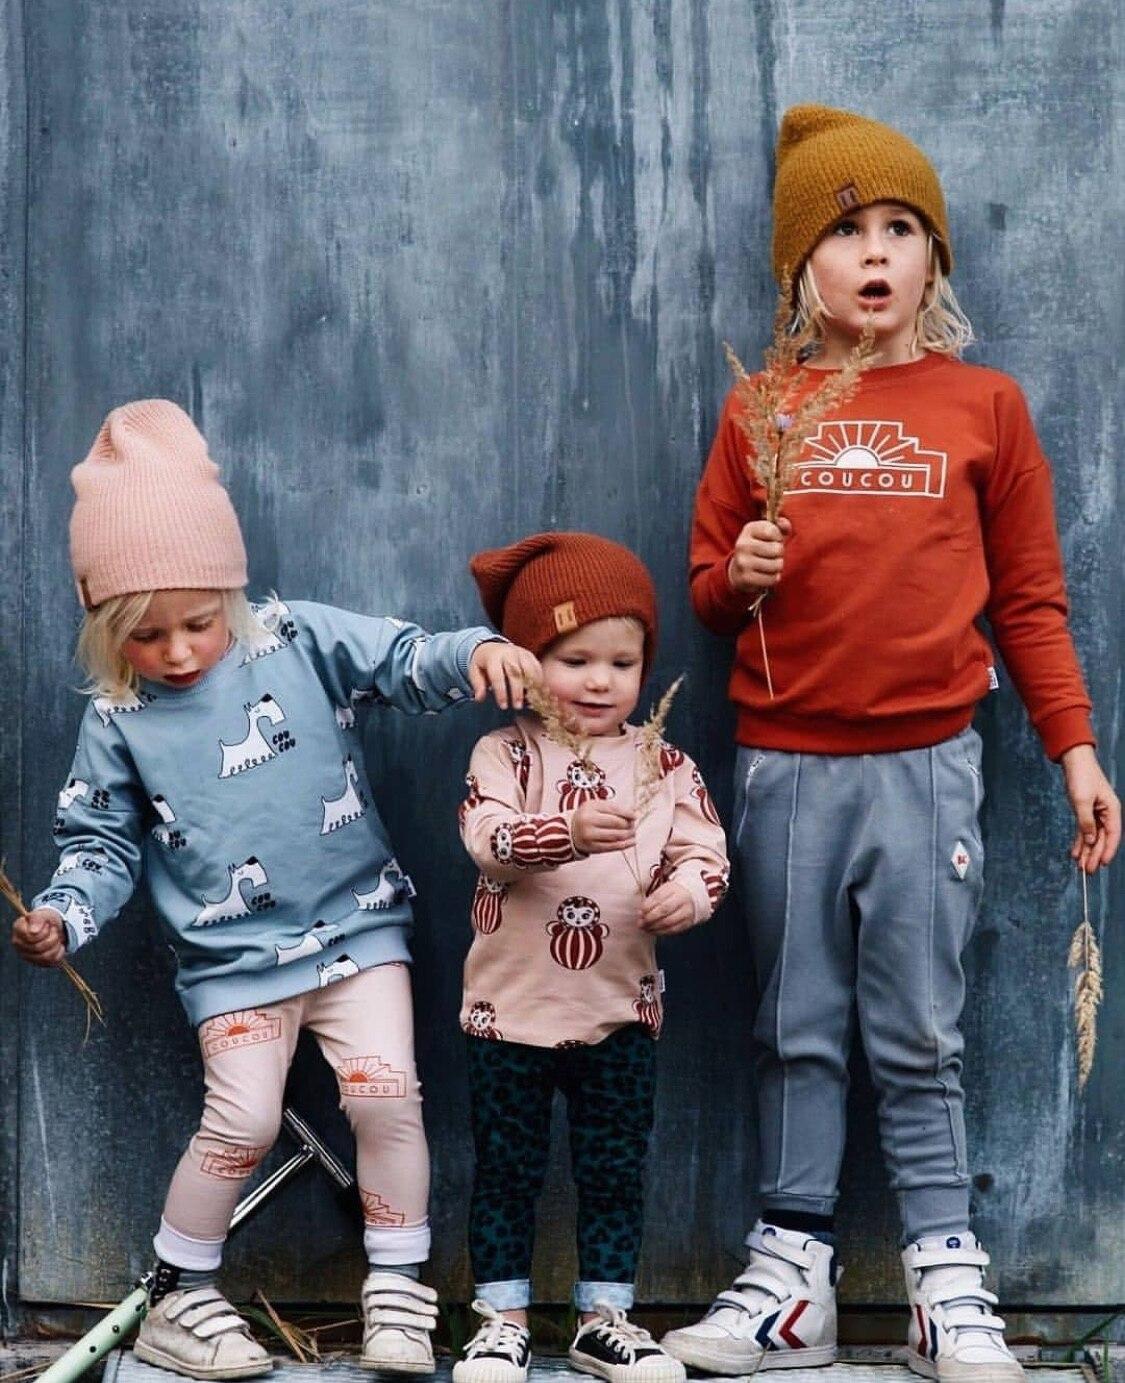 2021 Autumn Kids Long Sleeve T-shirt Sweatshirt Baby Girls Clothes Boys Jackets Coats Cartoon Tops Vacation Toddler Outfit Tops 2